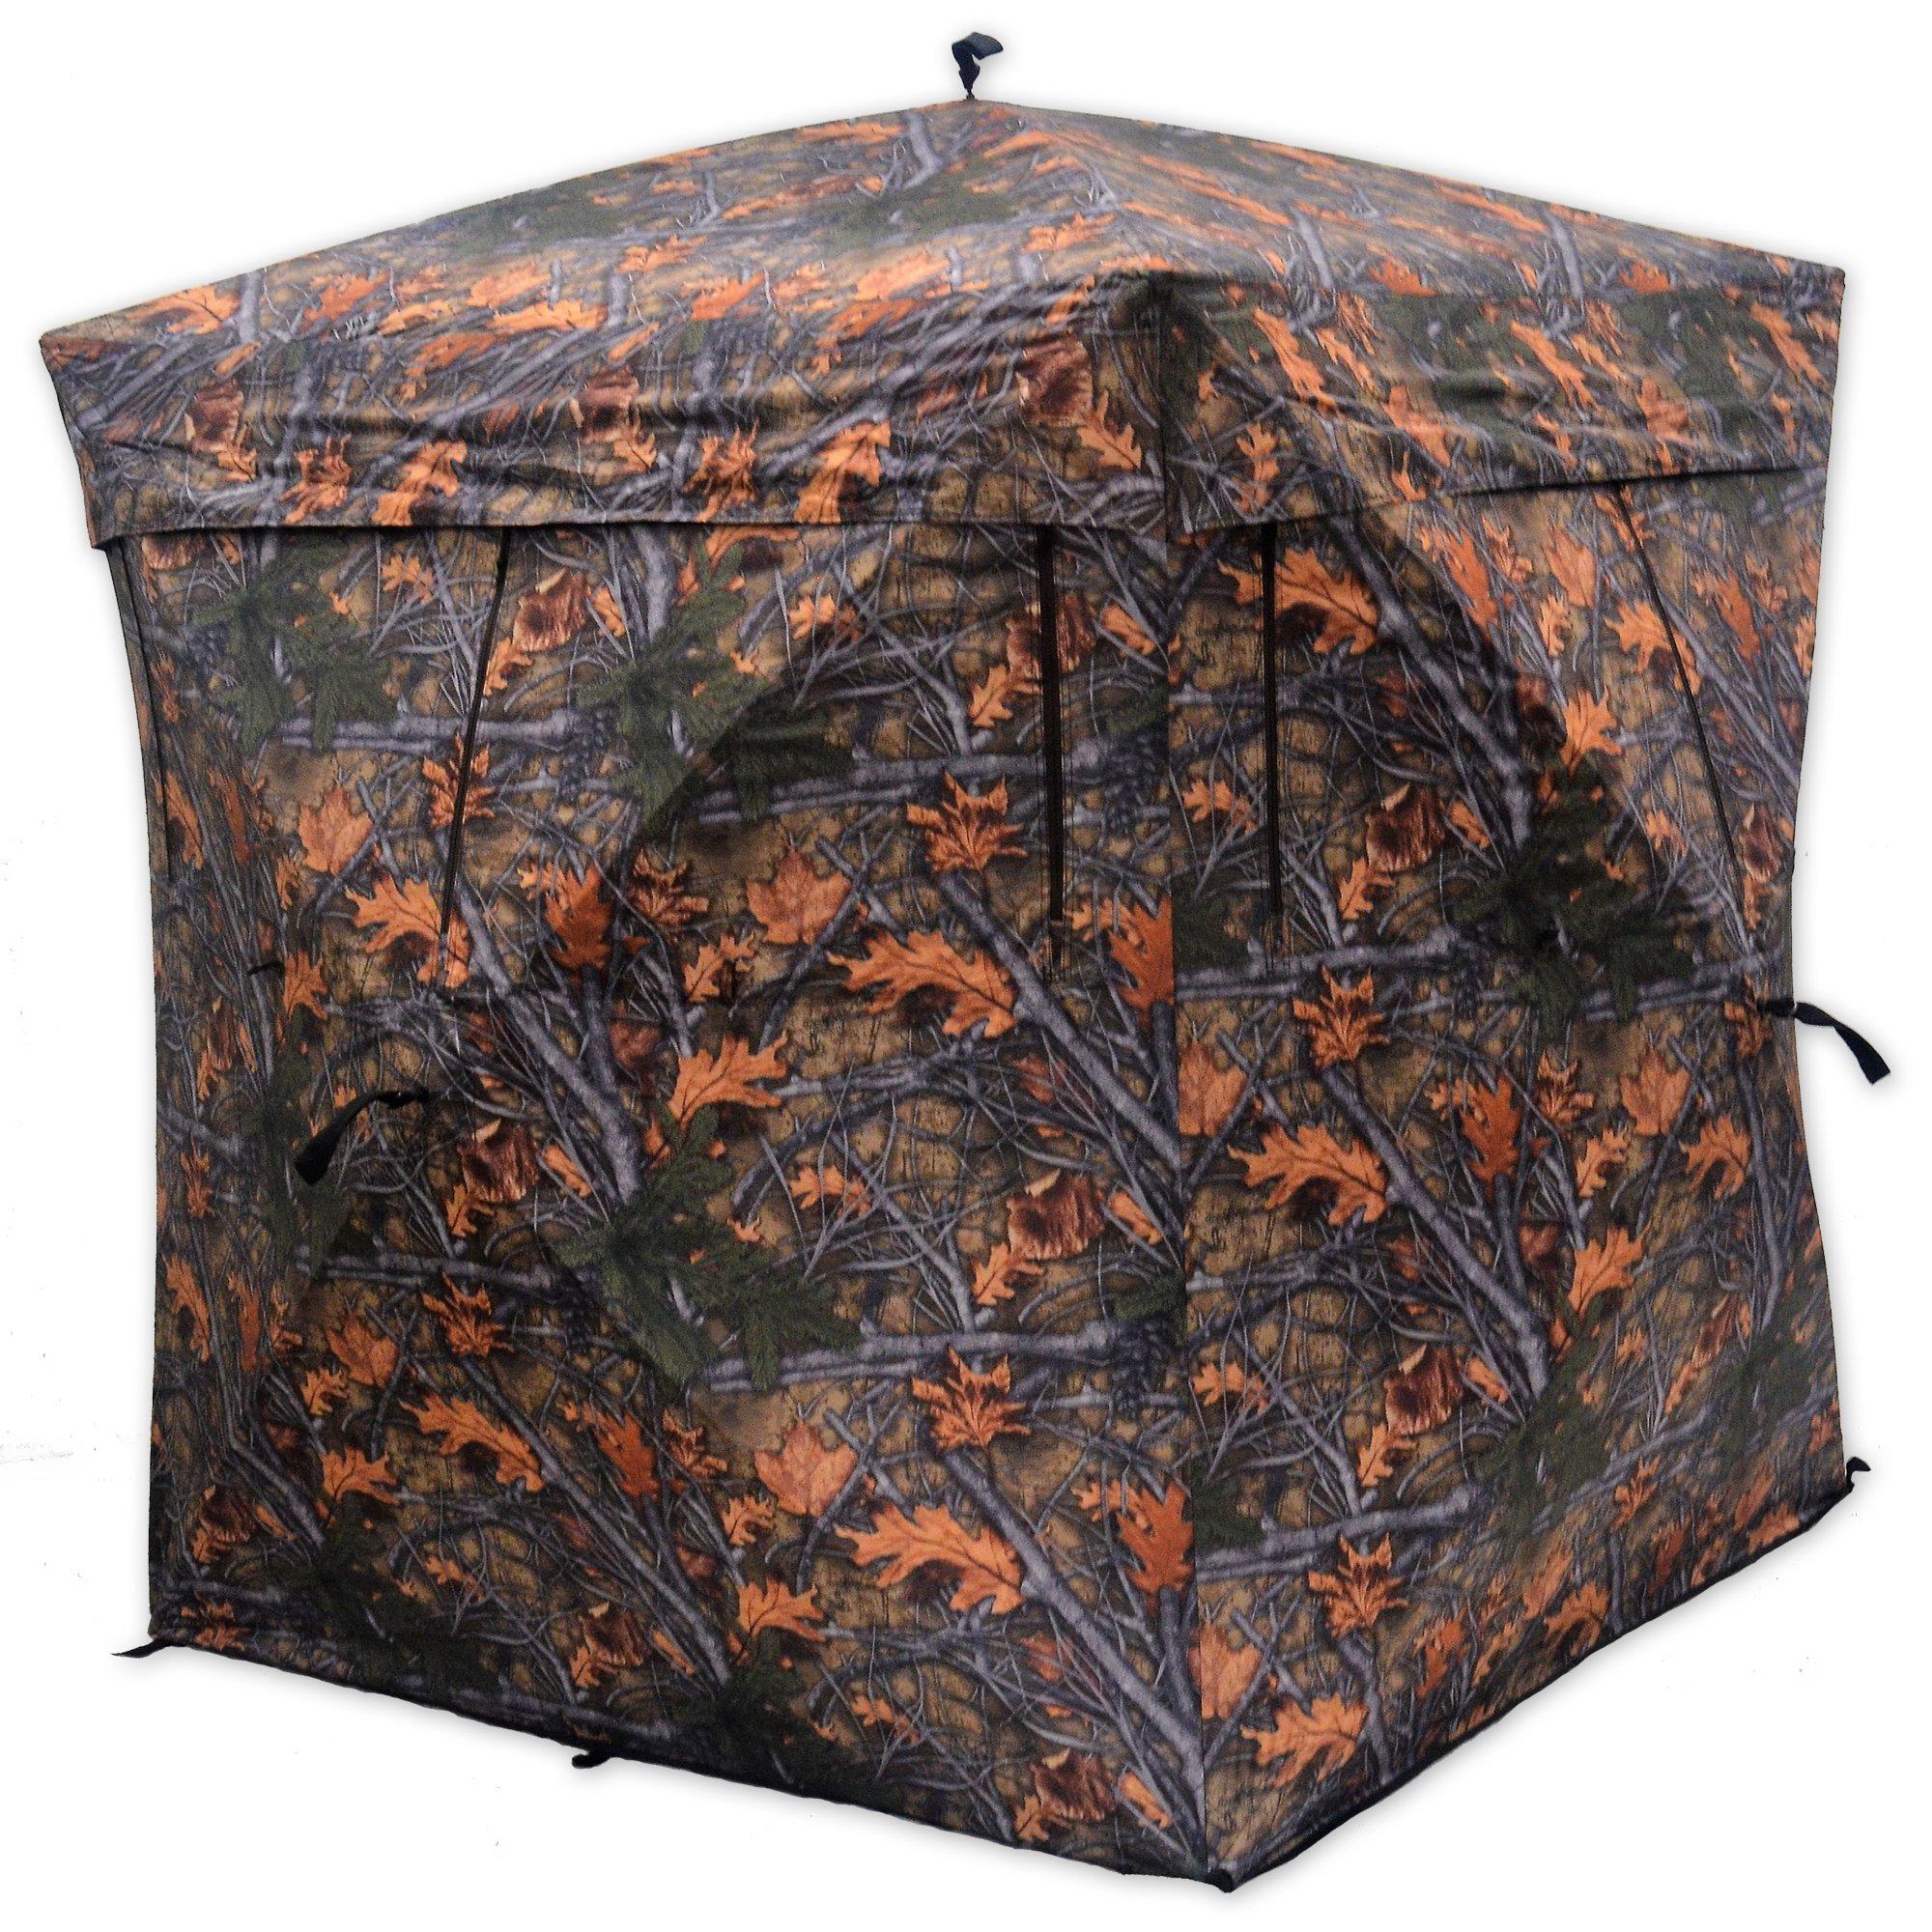 Copper Ridge Deluxe Hub Blind Camouflage